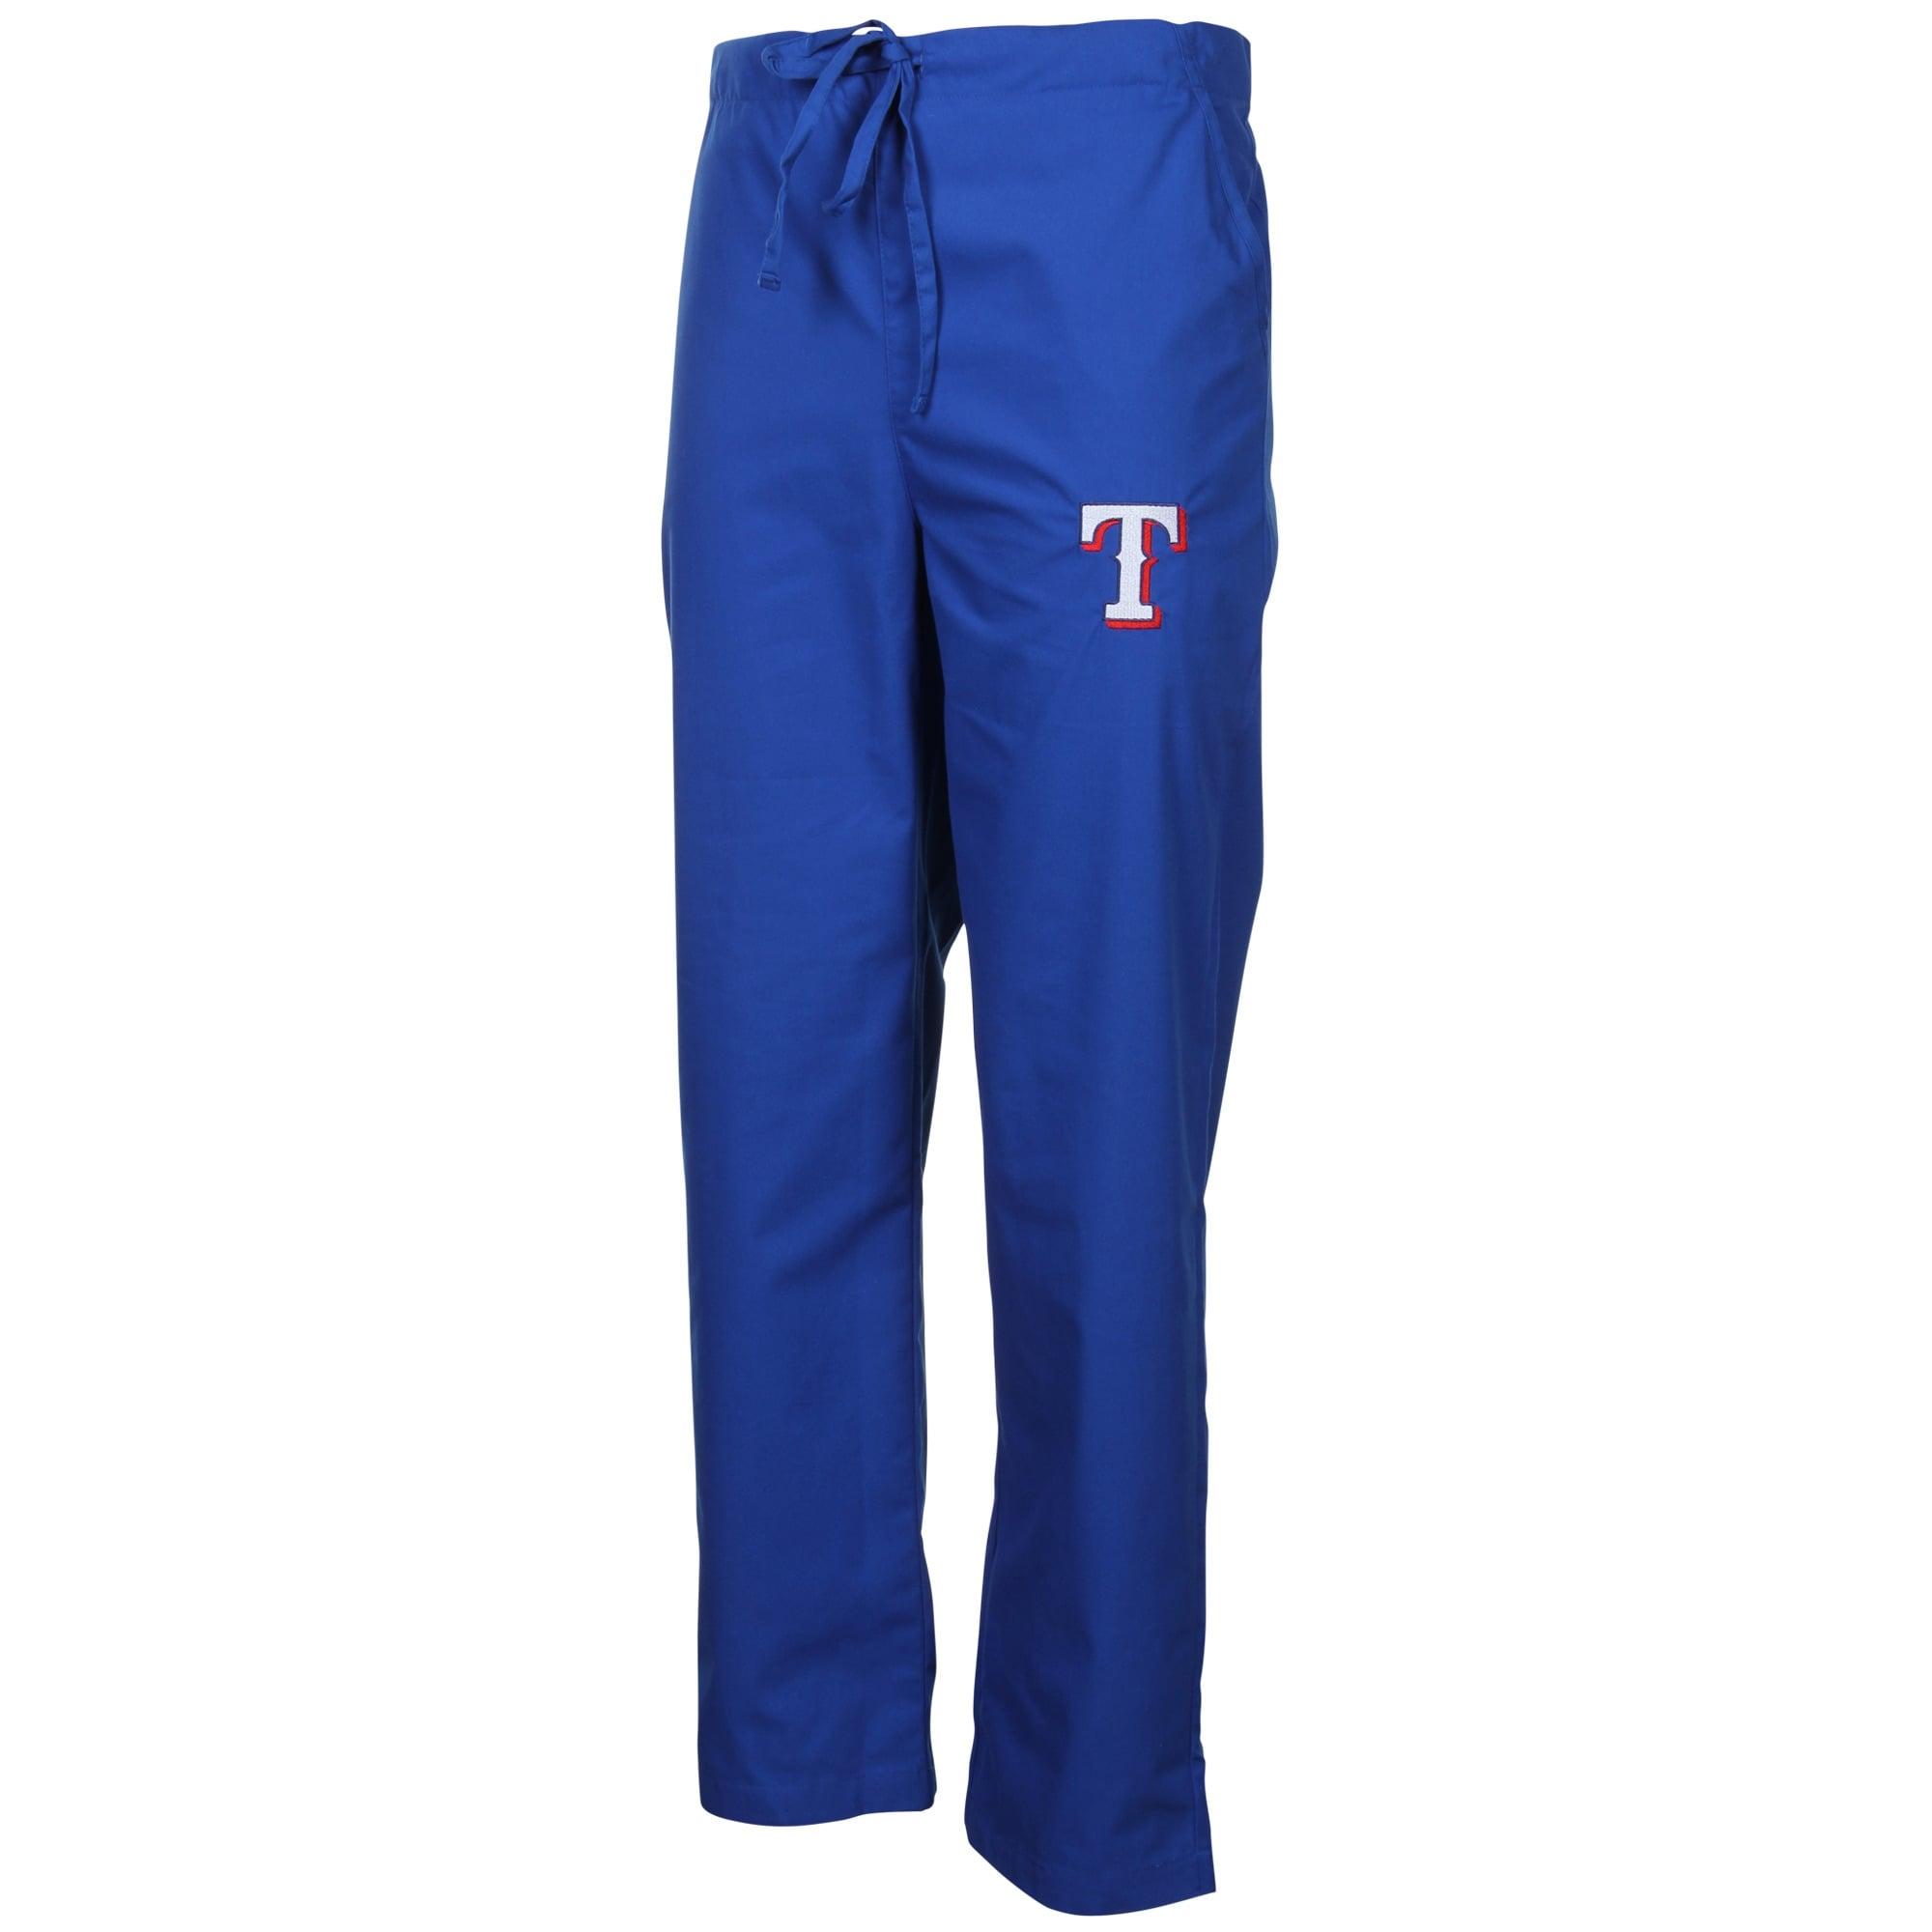 Texas Rangers Unisex Scrub Pants - Royal Blue